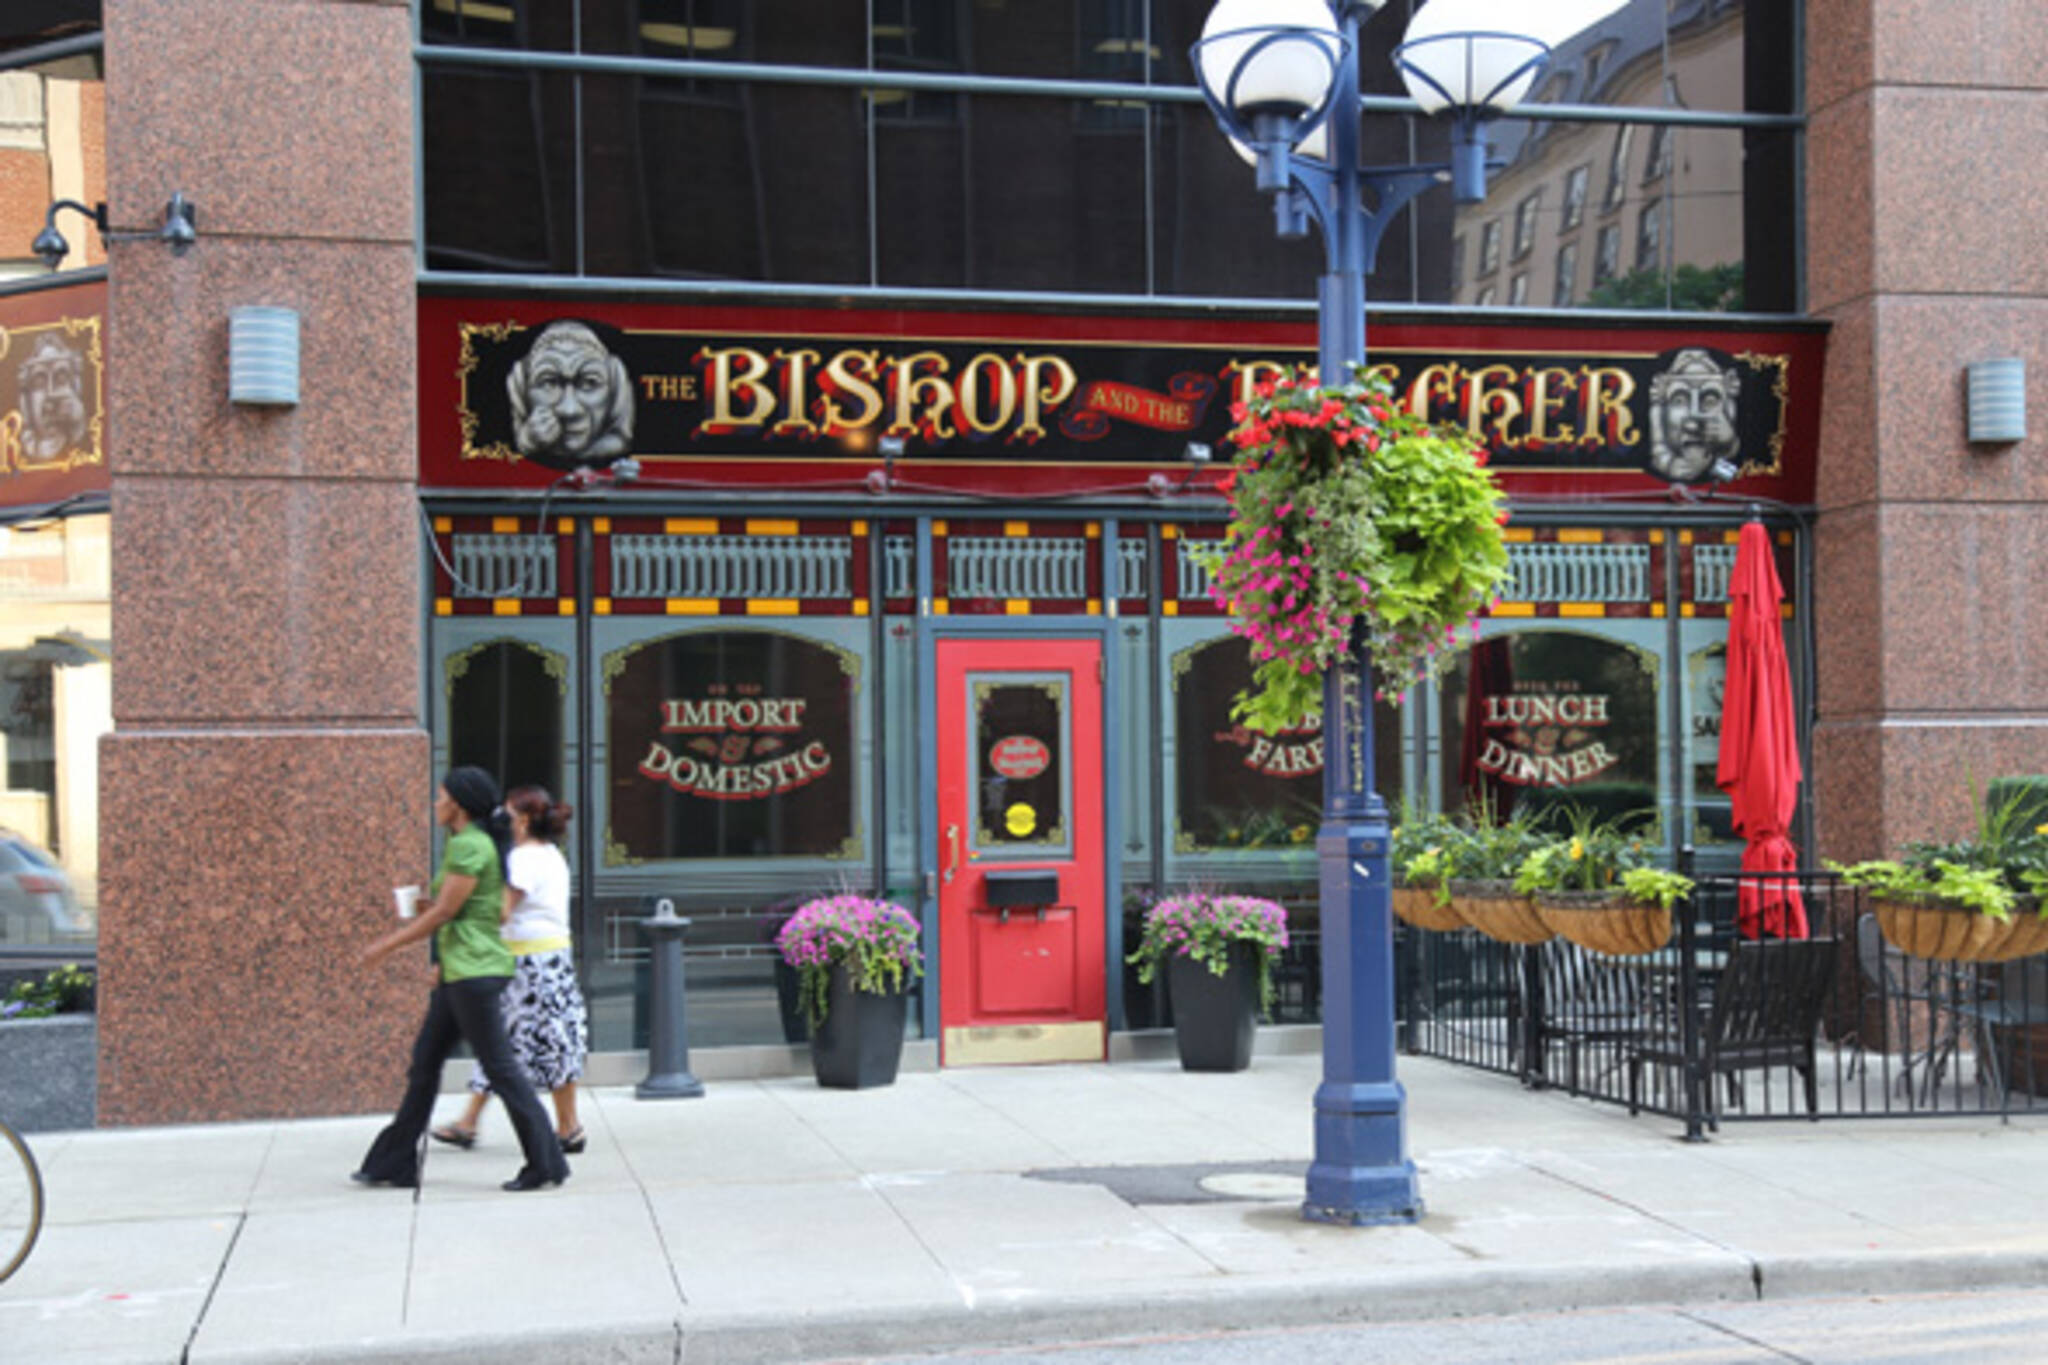 Bishop and the Belcher Toronto